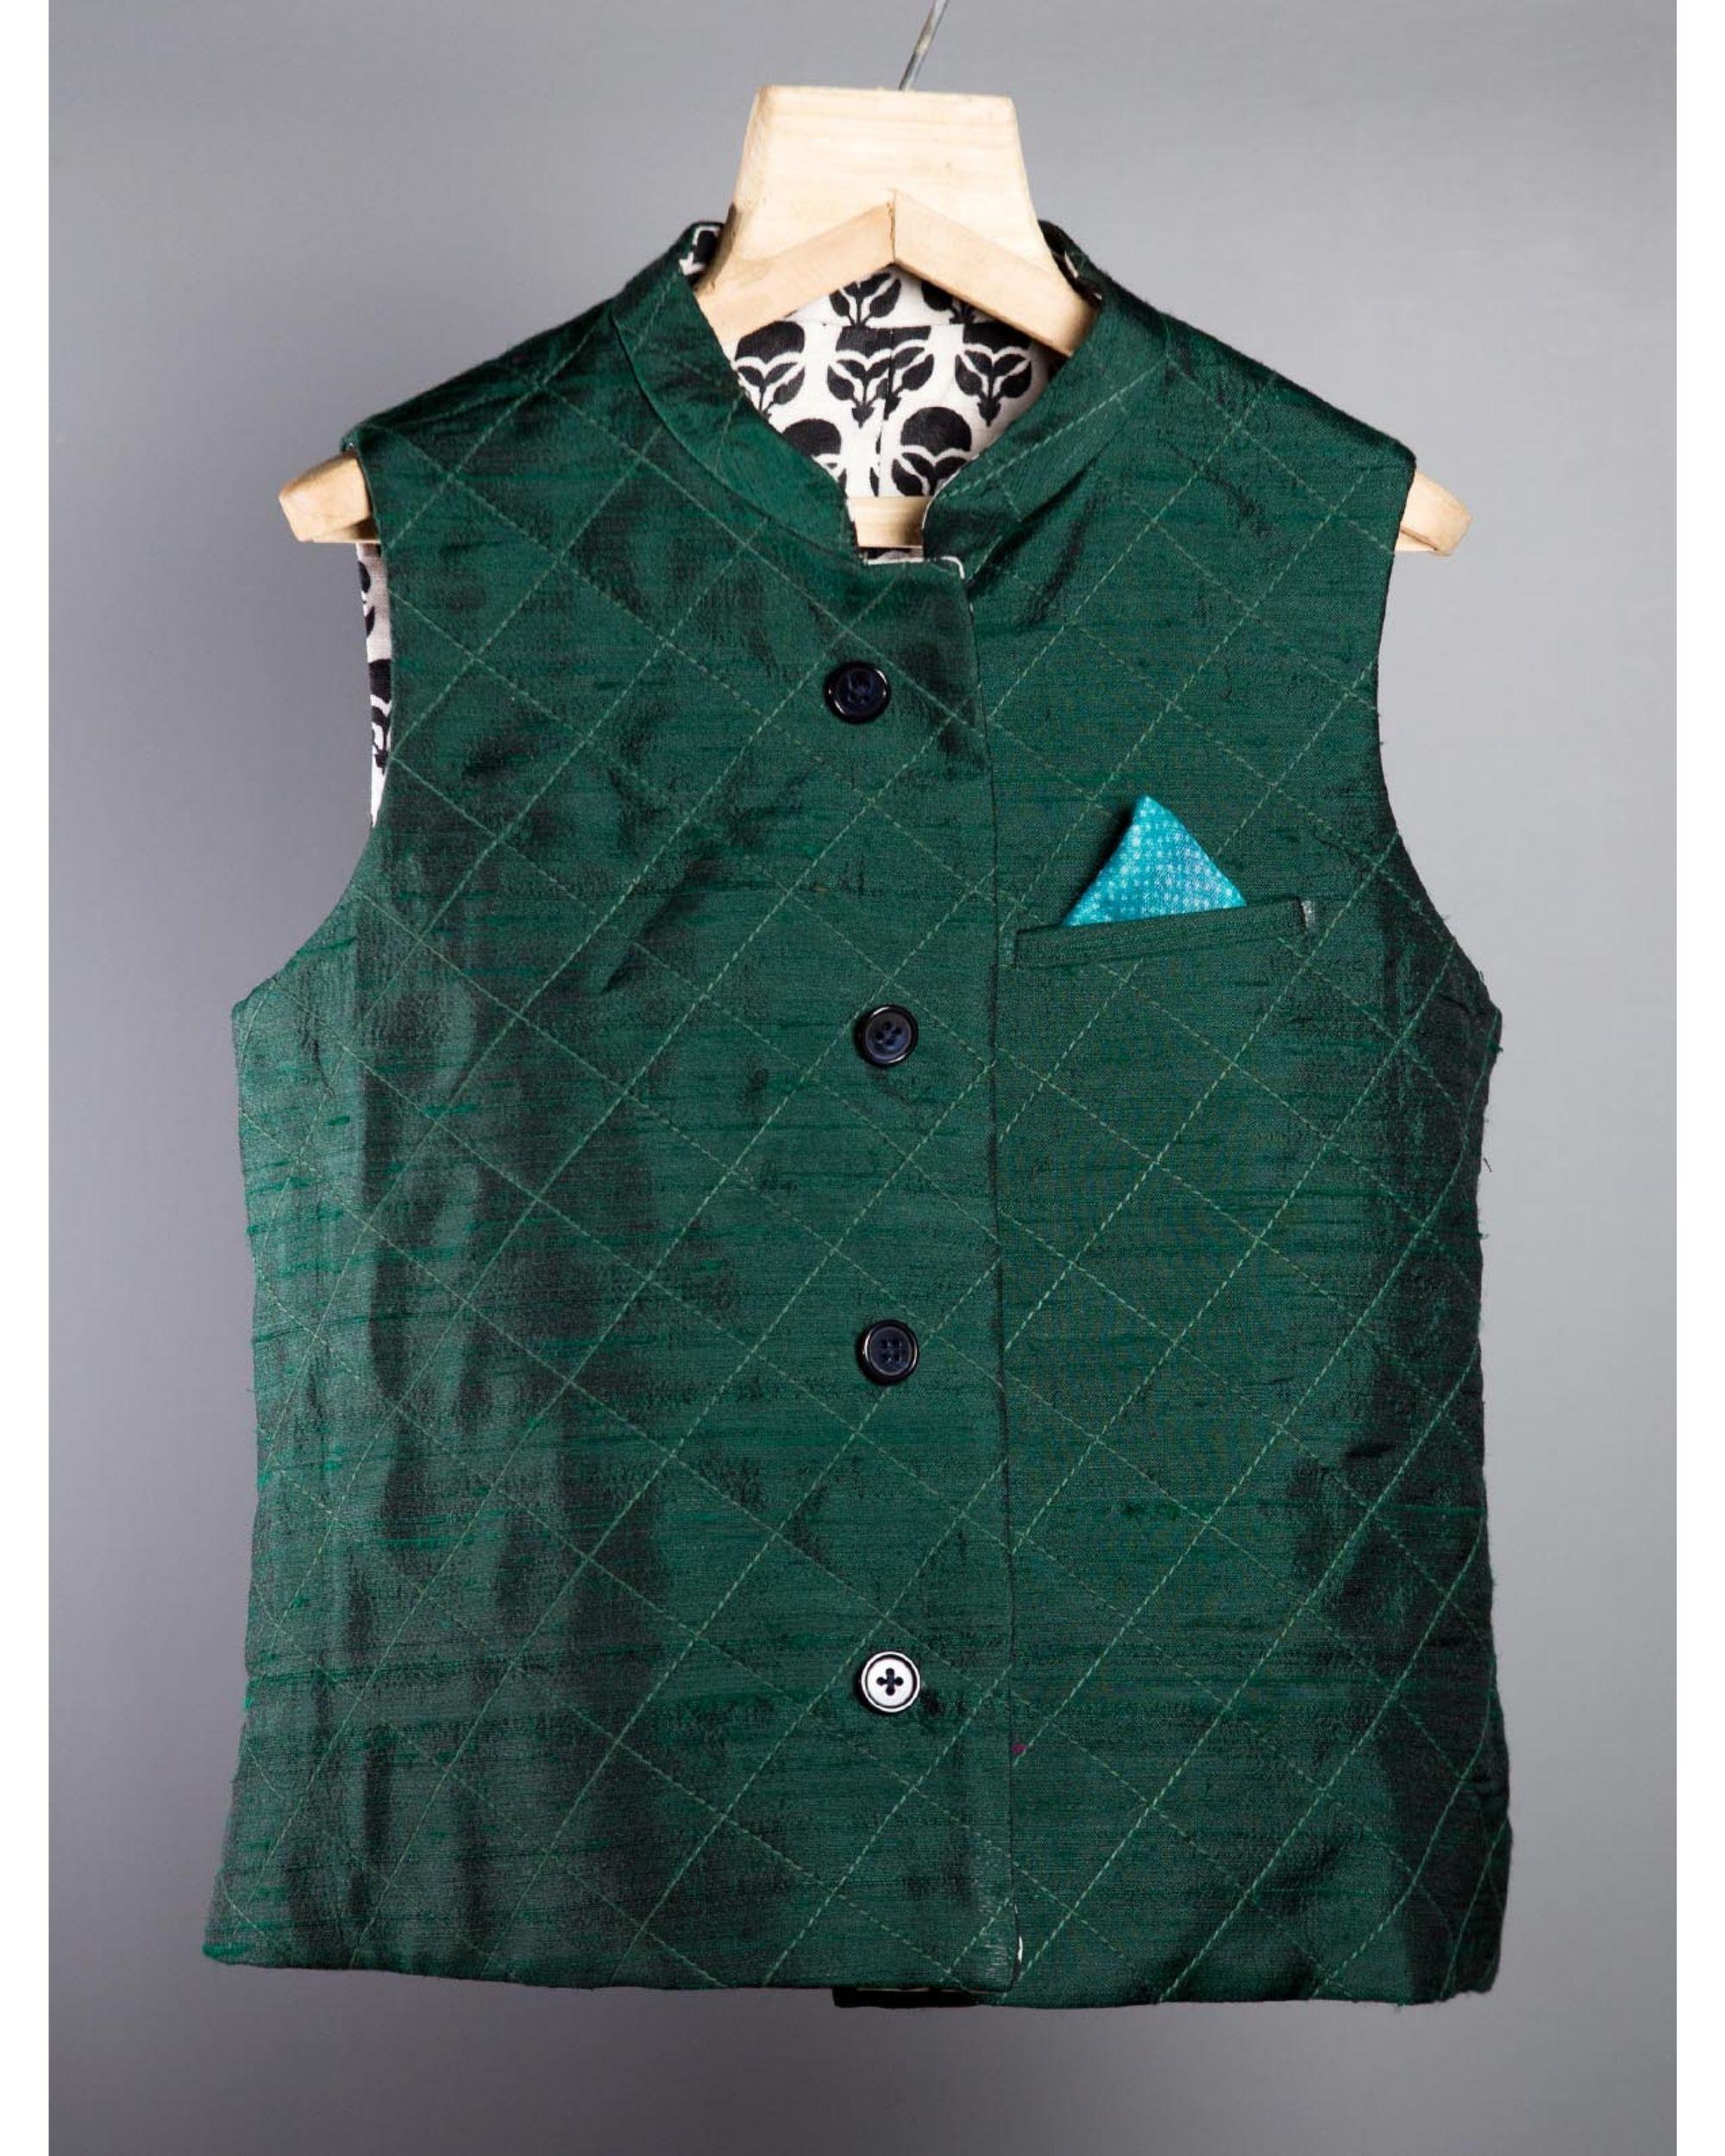 Bottle green embroidered jacket